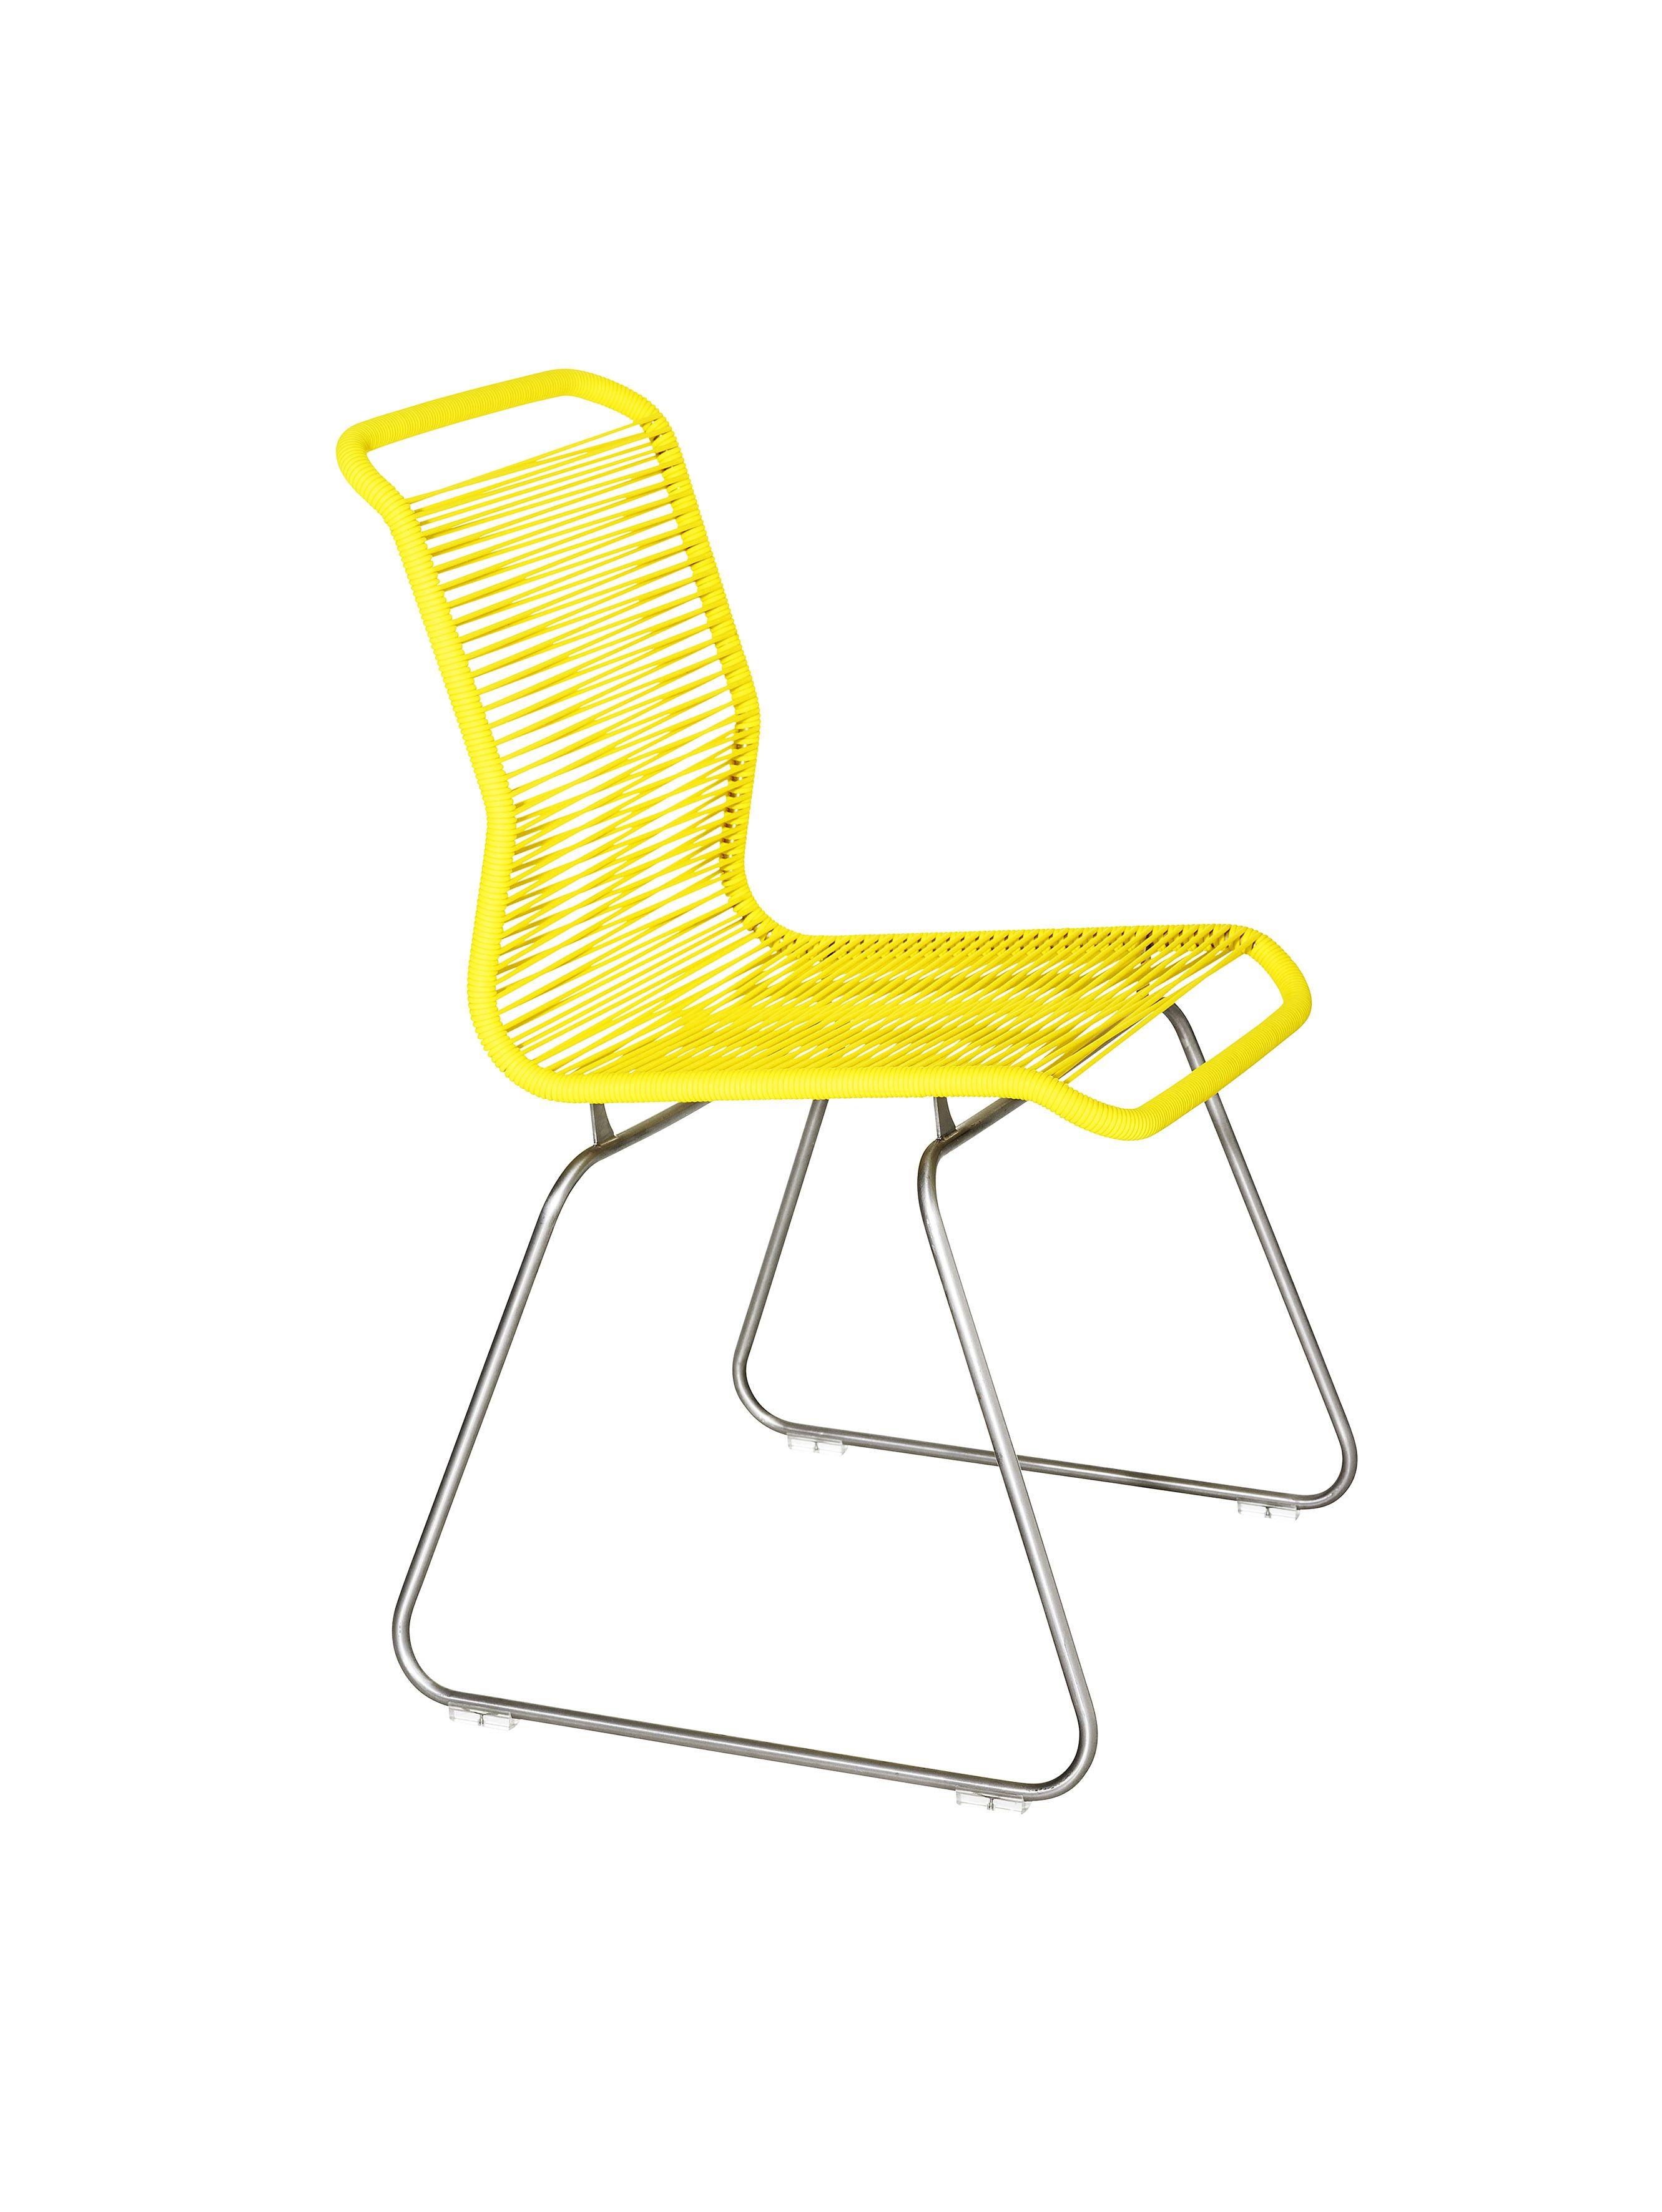 Oppdatert The Panton One chair in Tokyo Yellow. #montana #furniture #panton LA-43